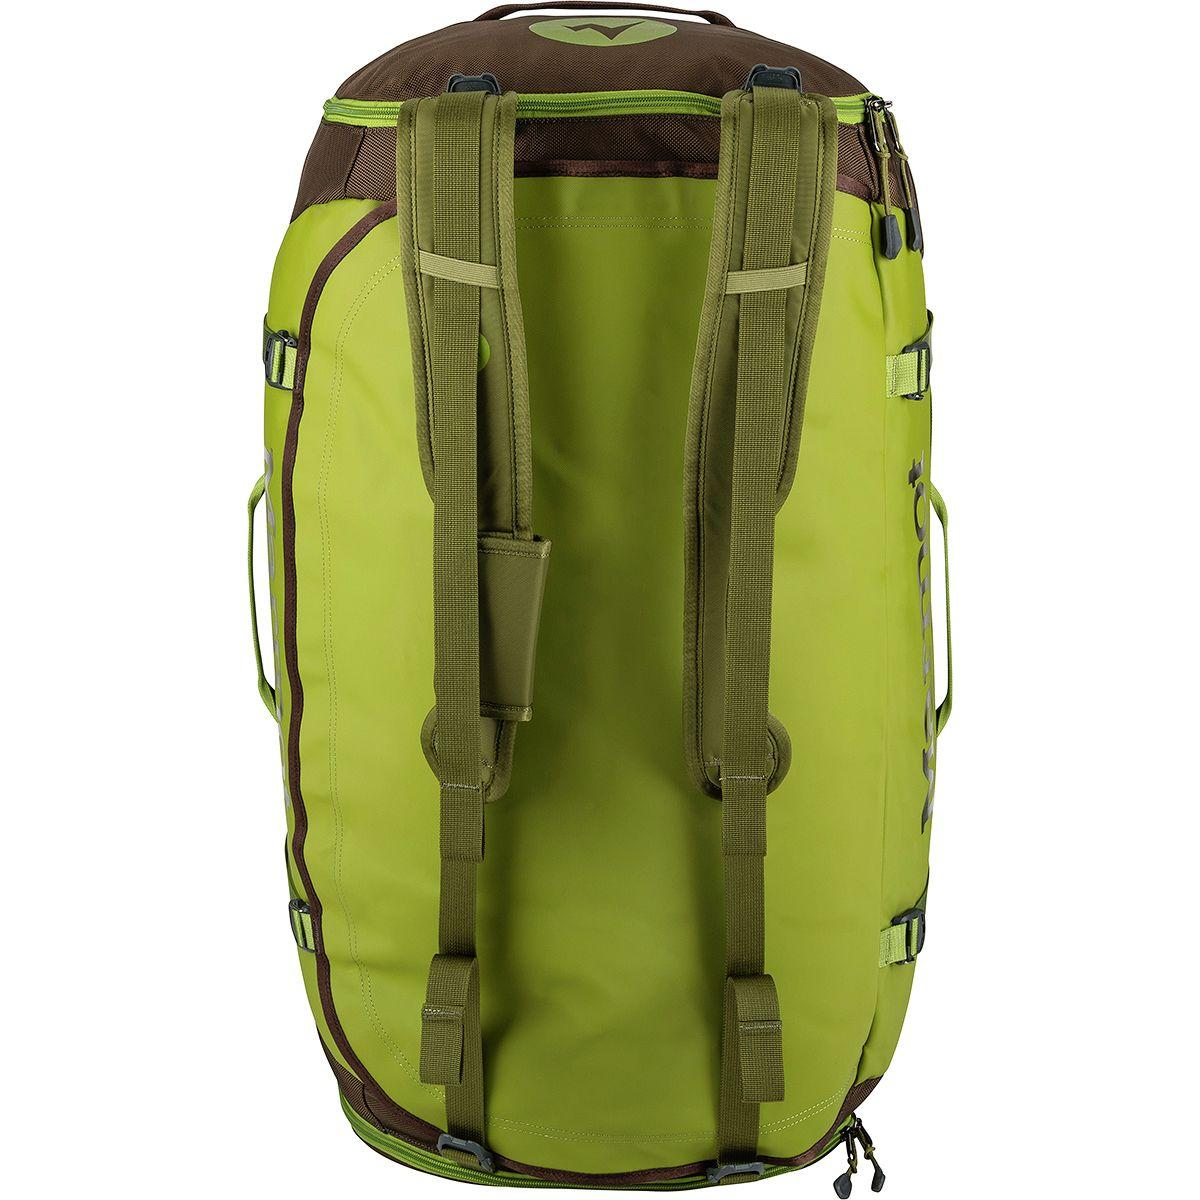 444fee8c14a Lyst - Marmot Long Hauler Large 75l Duffel Bag in Green for Men ...